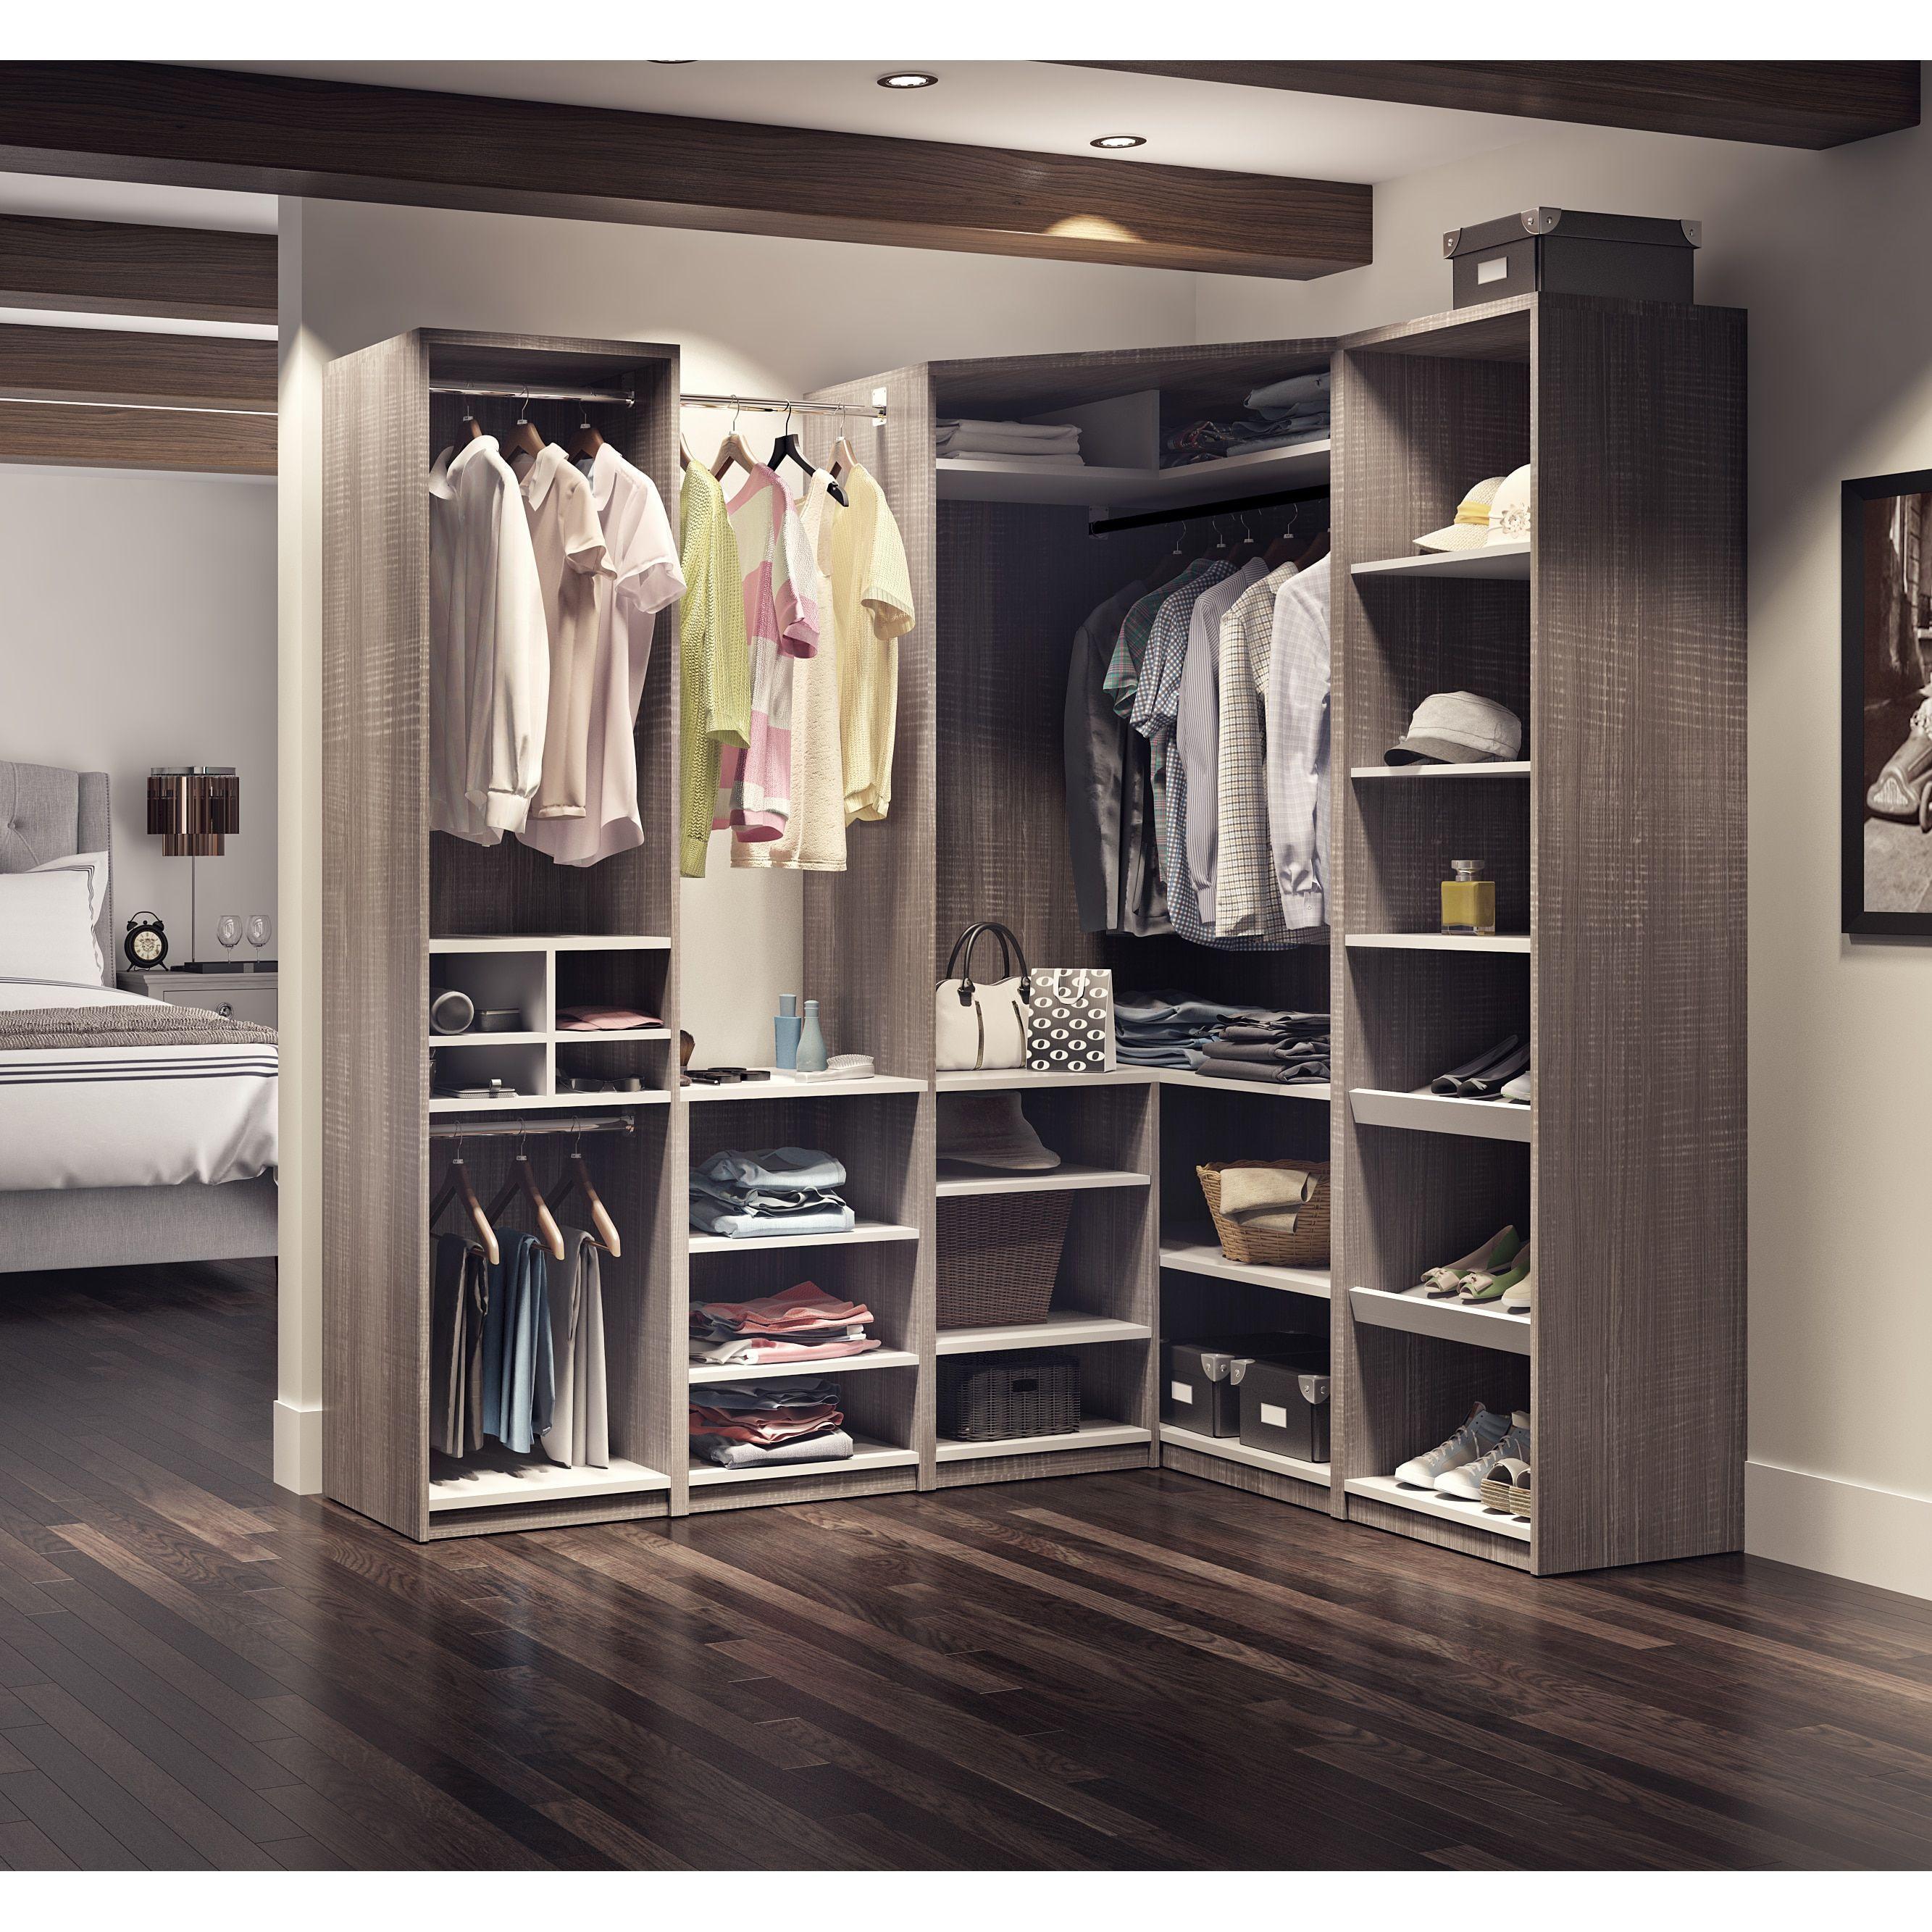 Cielo By Bestar Classic Corner Walk In Closet Bark Grey Brown Gray Laminate Closet System Closet Designs Corner Closet